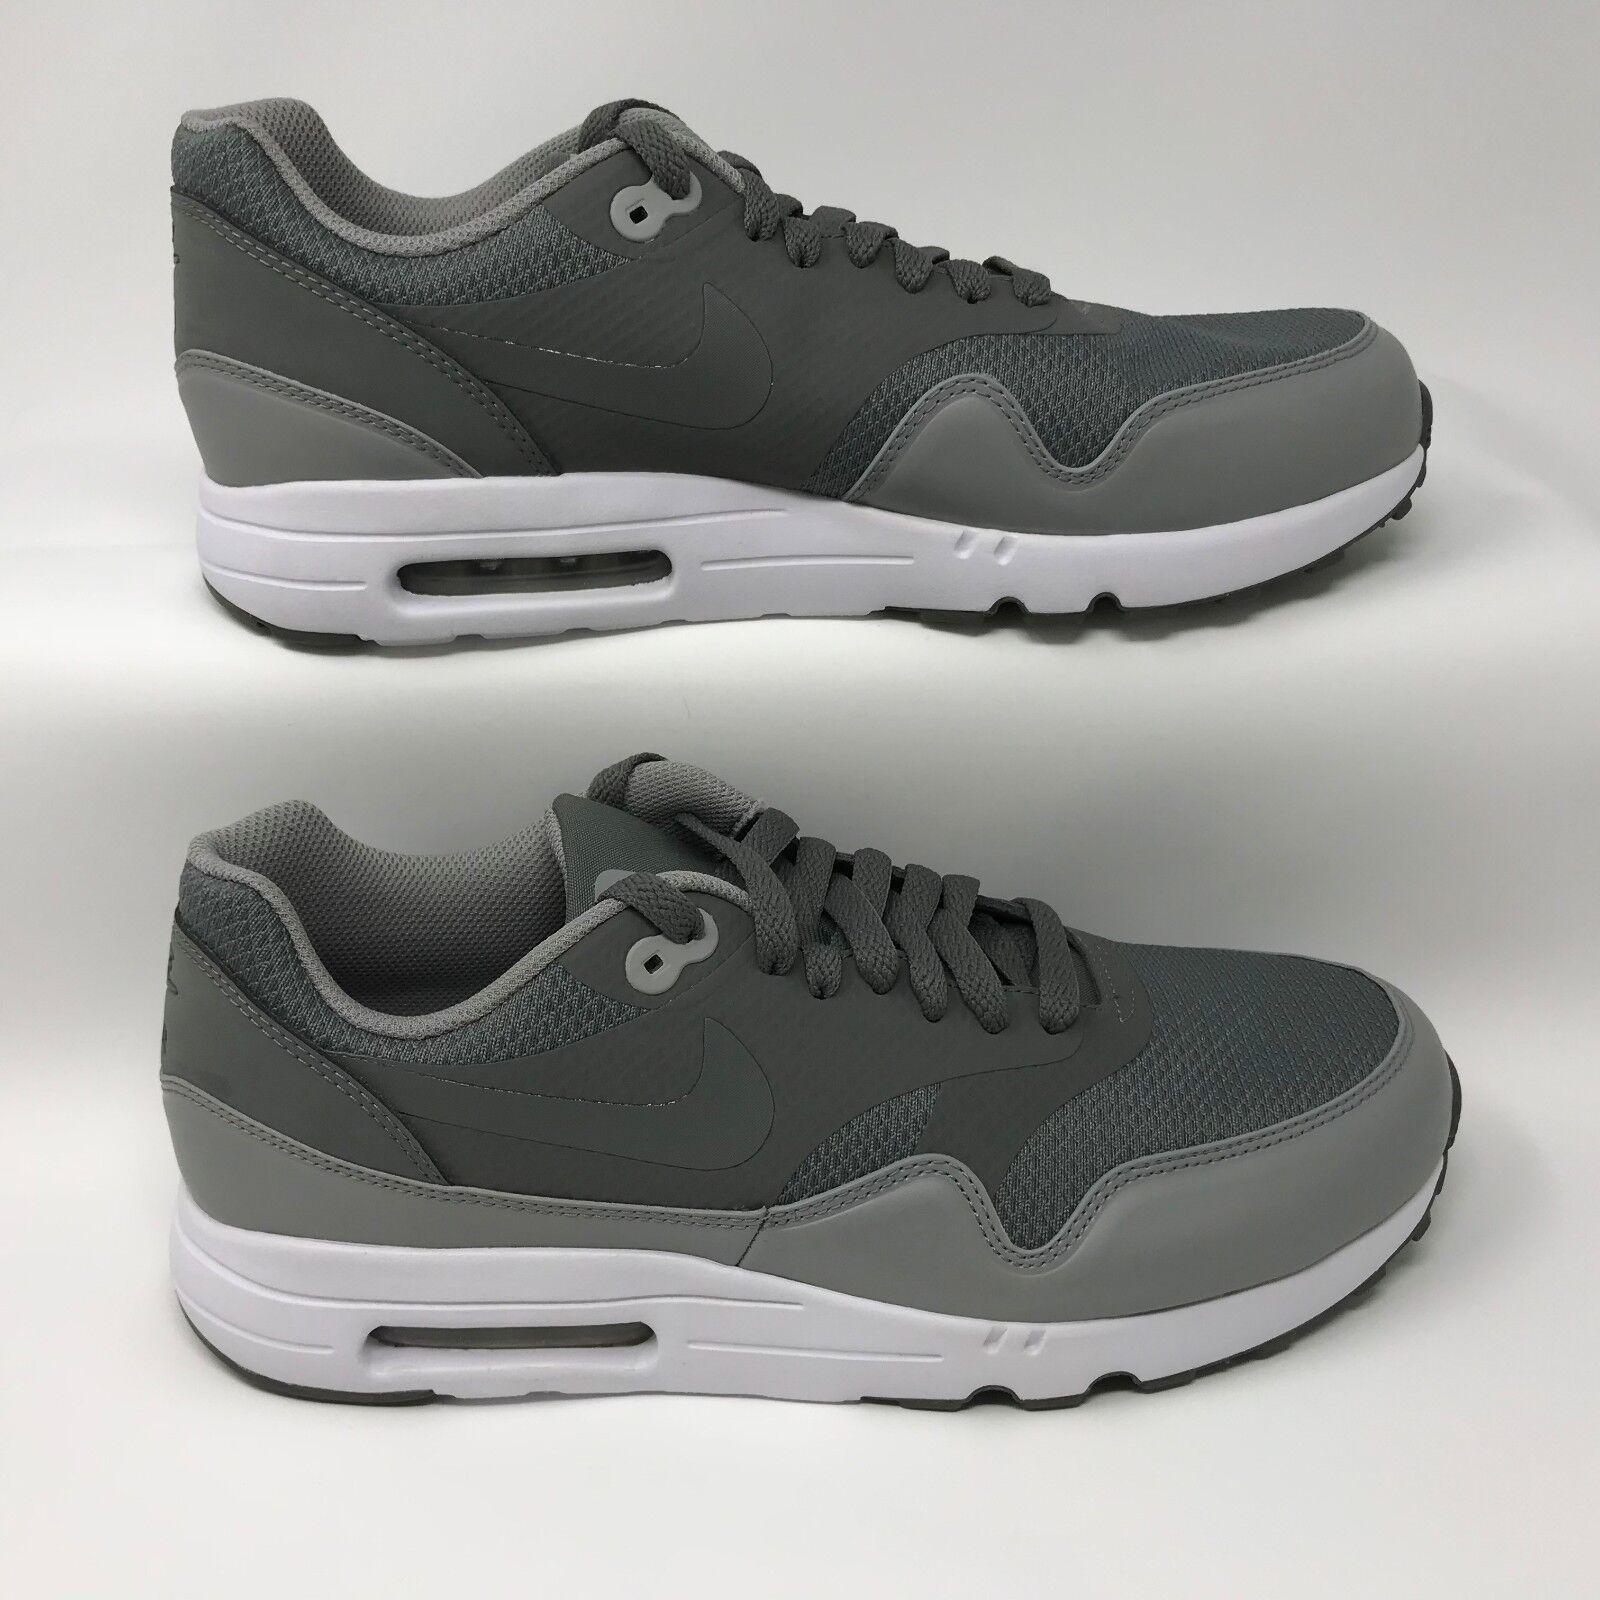 Nike 875679-003 Men's Air Max 1 Ultra 2.0 Essential Grey Size 9